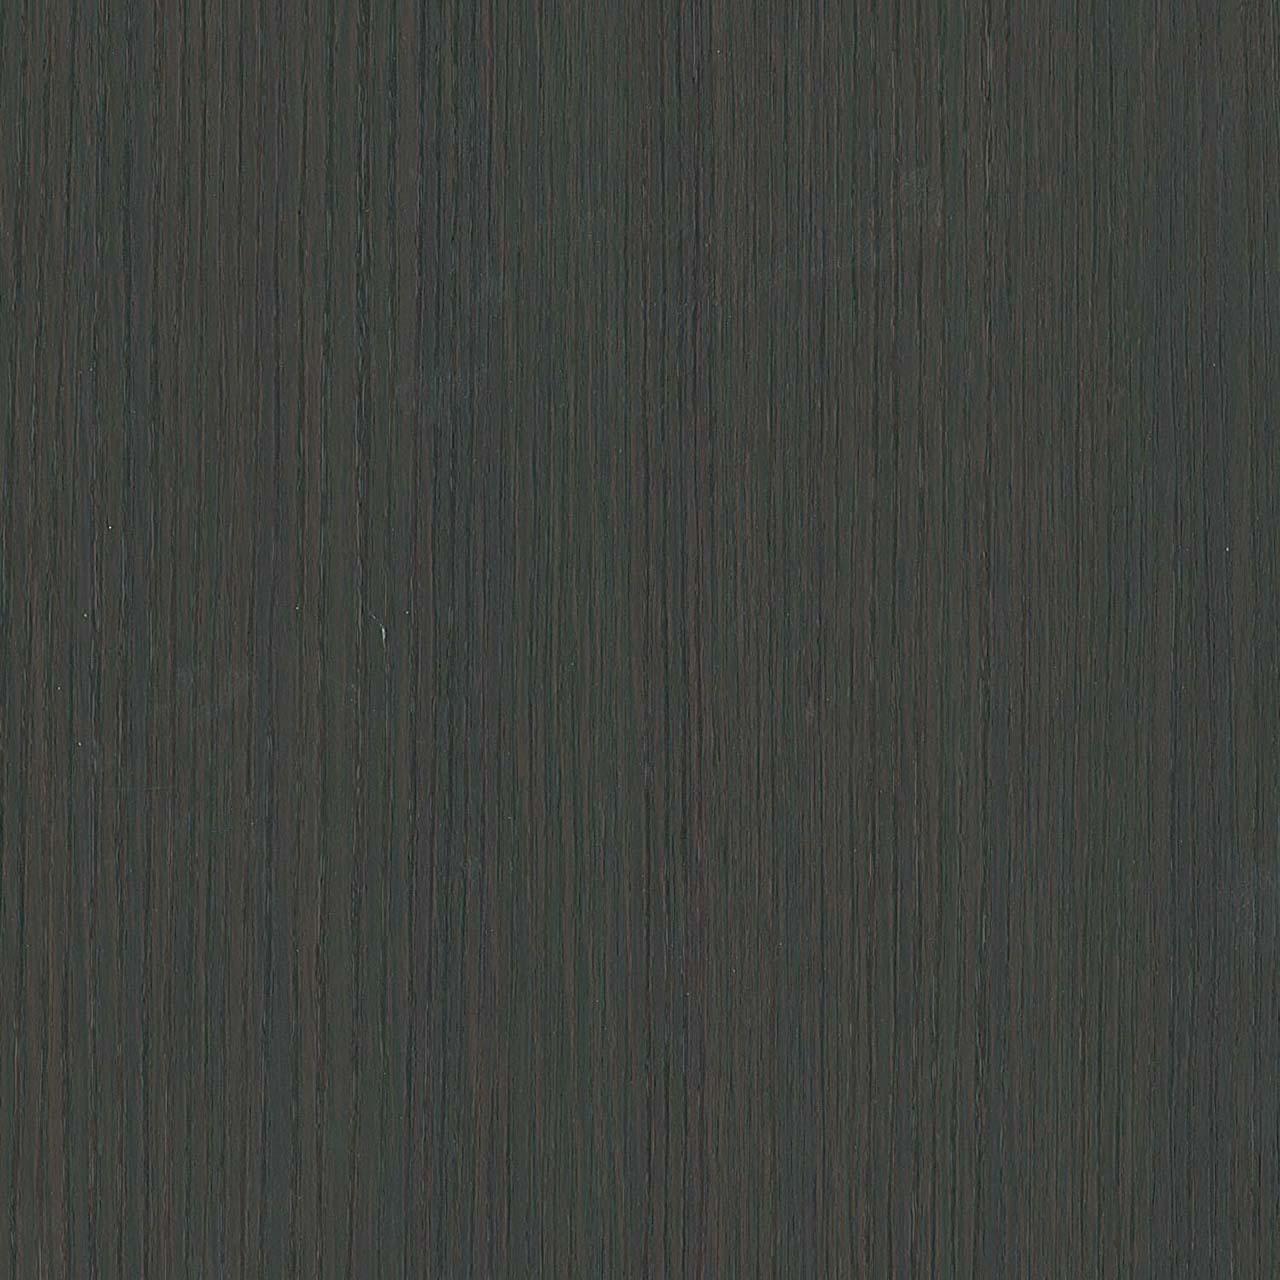 Textured Wenge effect laminate panel